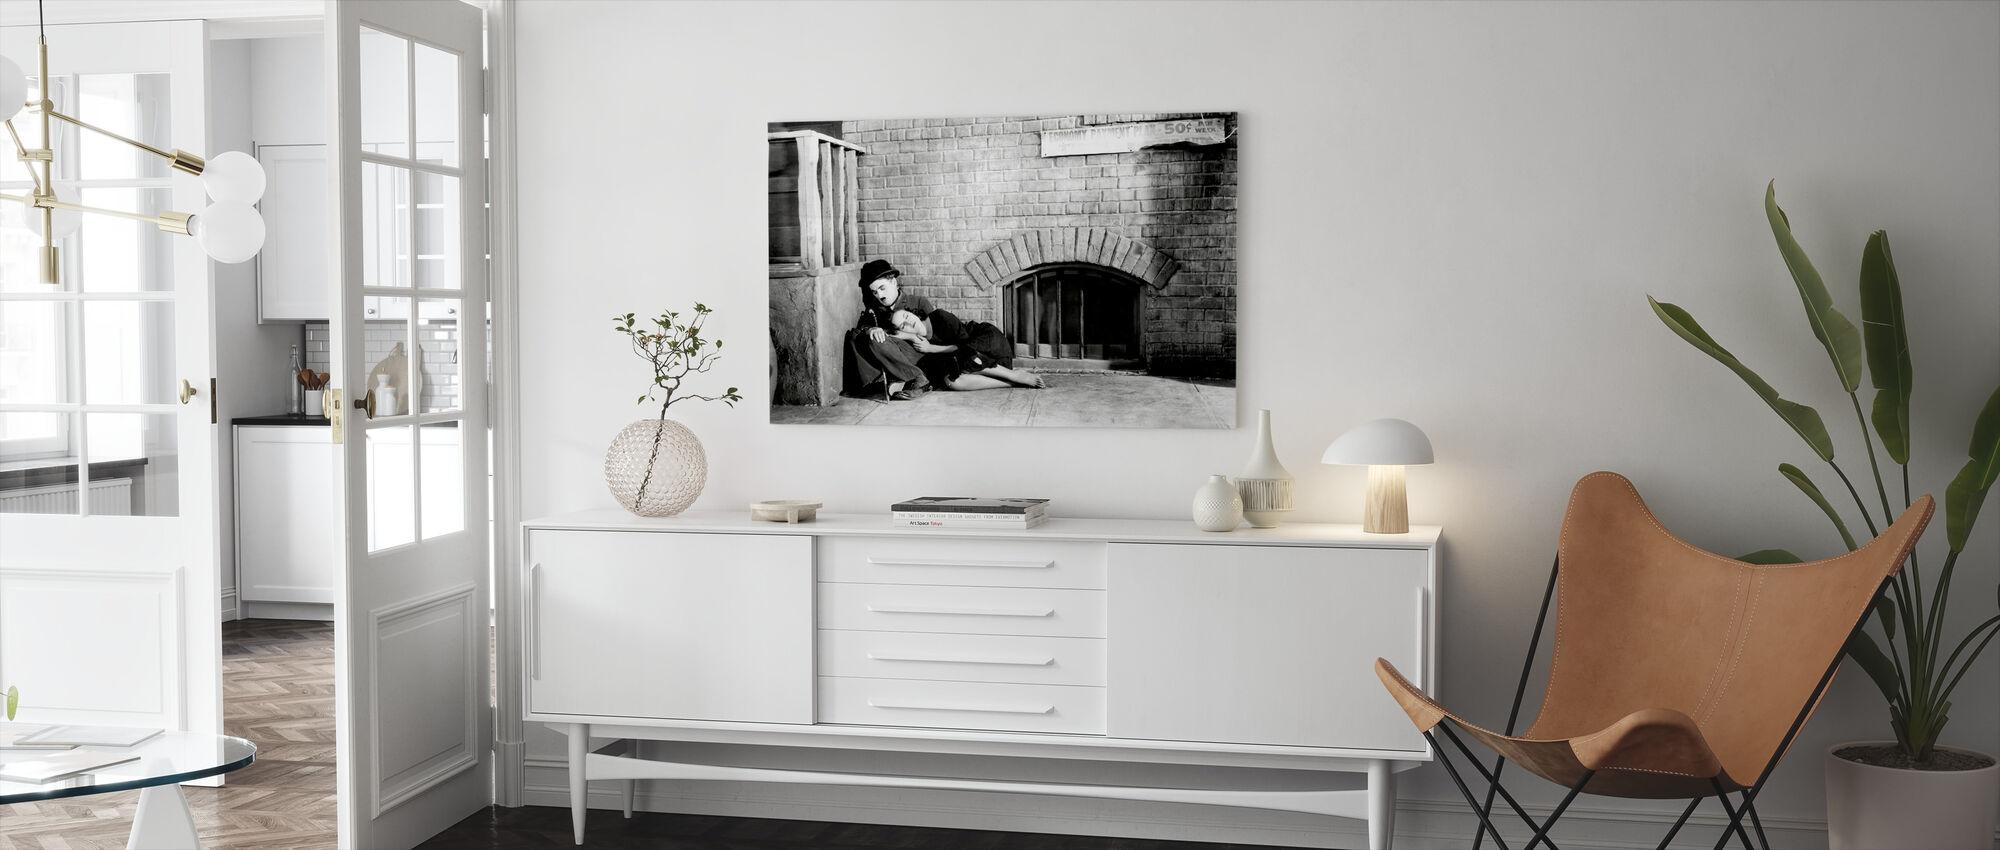 Charlie Chaplin og Paulette Goddard i moderne tid - Lerretsbilde - Stue